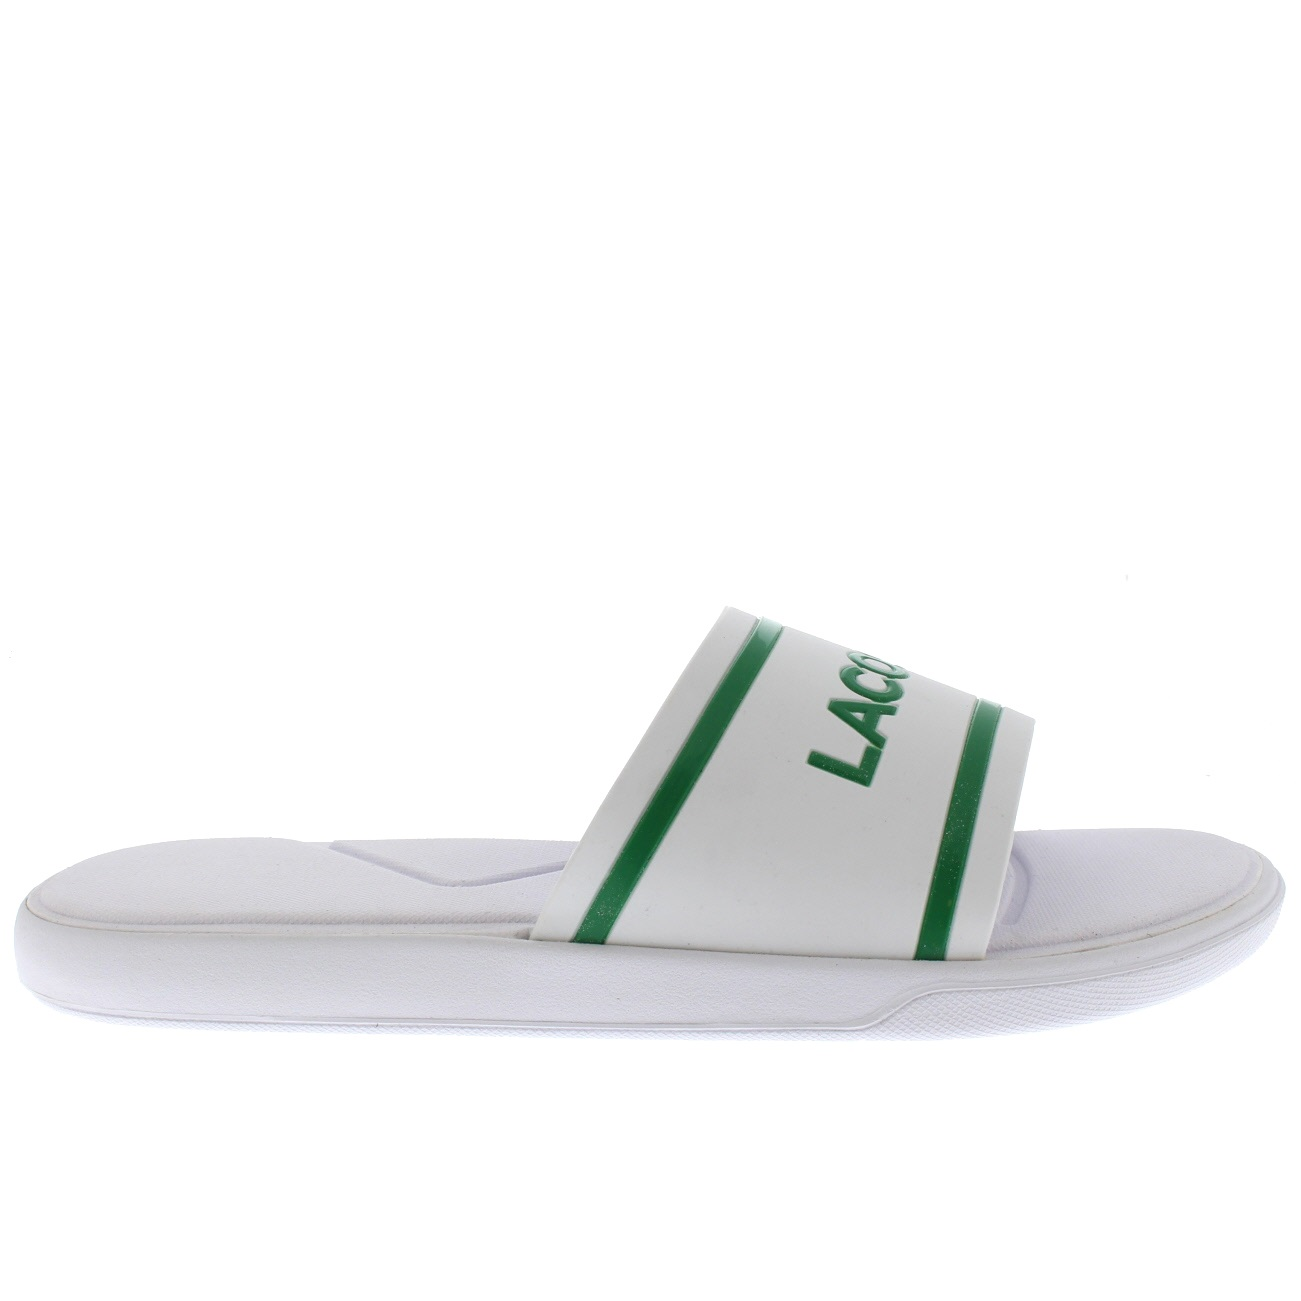 f13d2aba656b4b Mens Lacoste L.30 118 2 Slides Rubber Lightweight Summer Open Toe ...